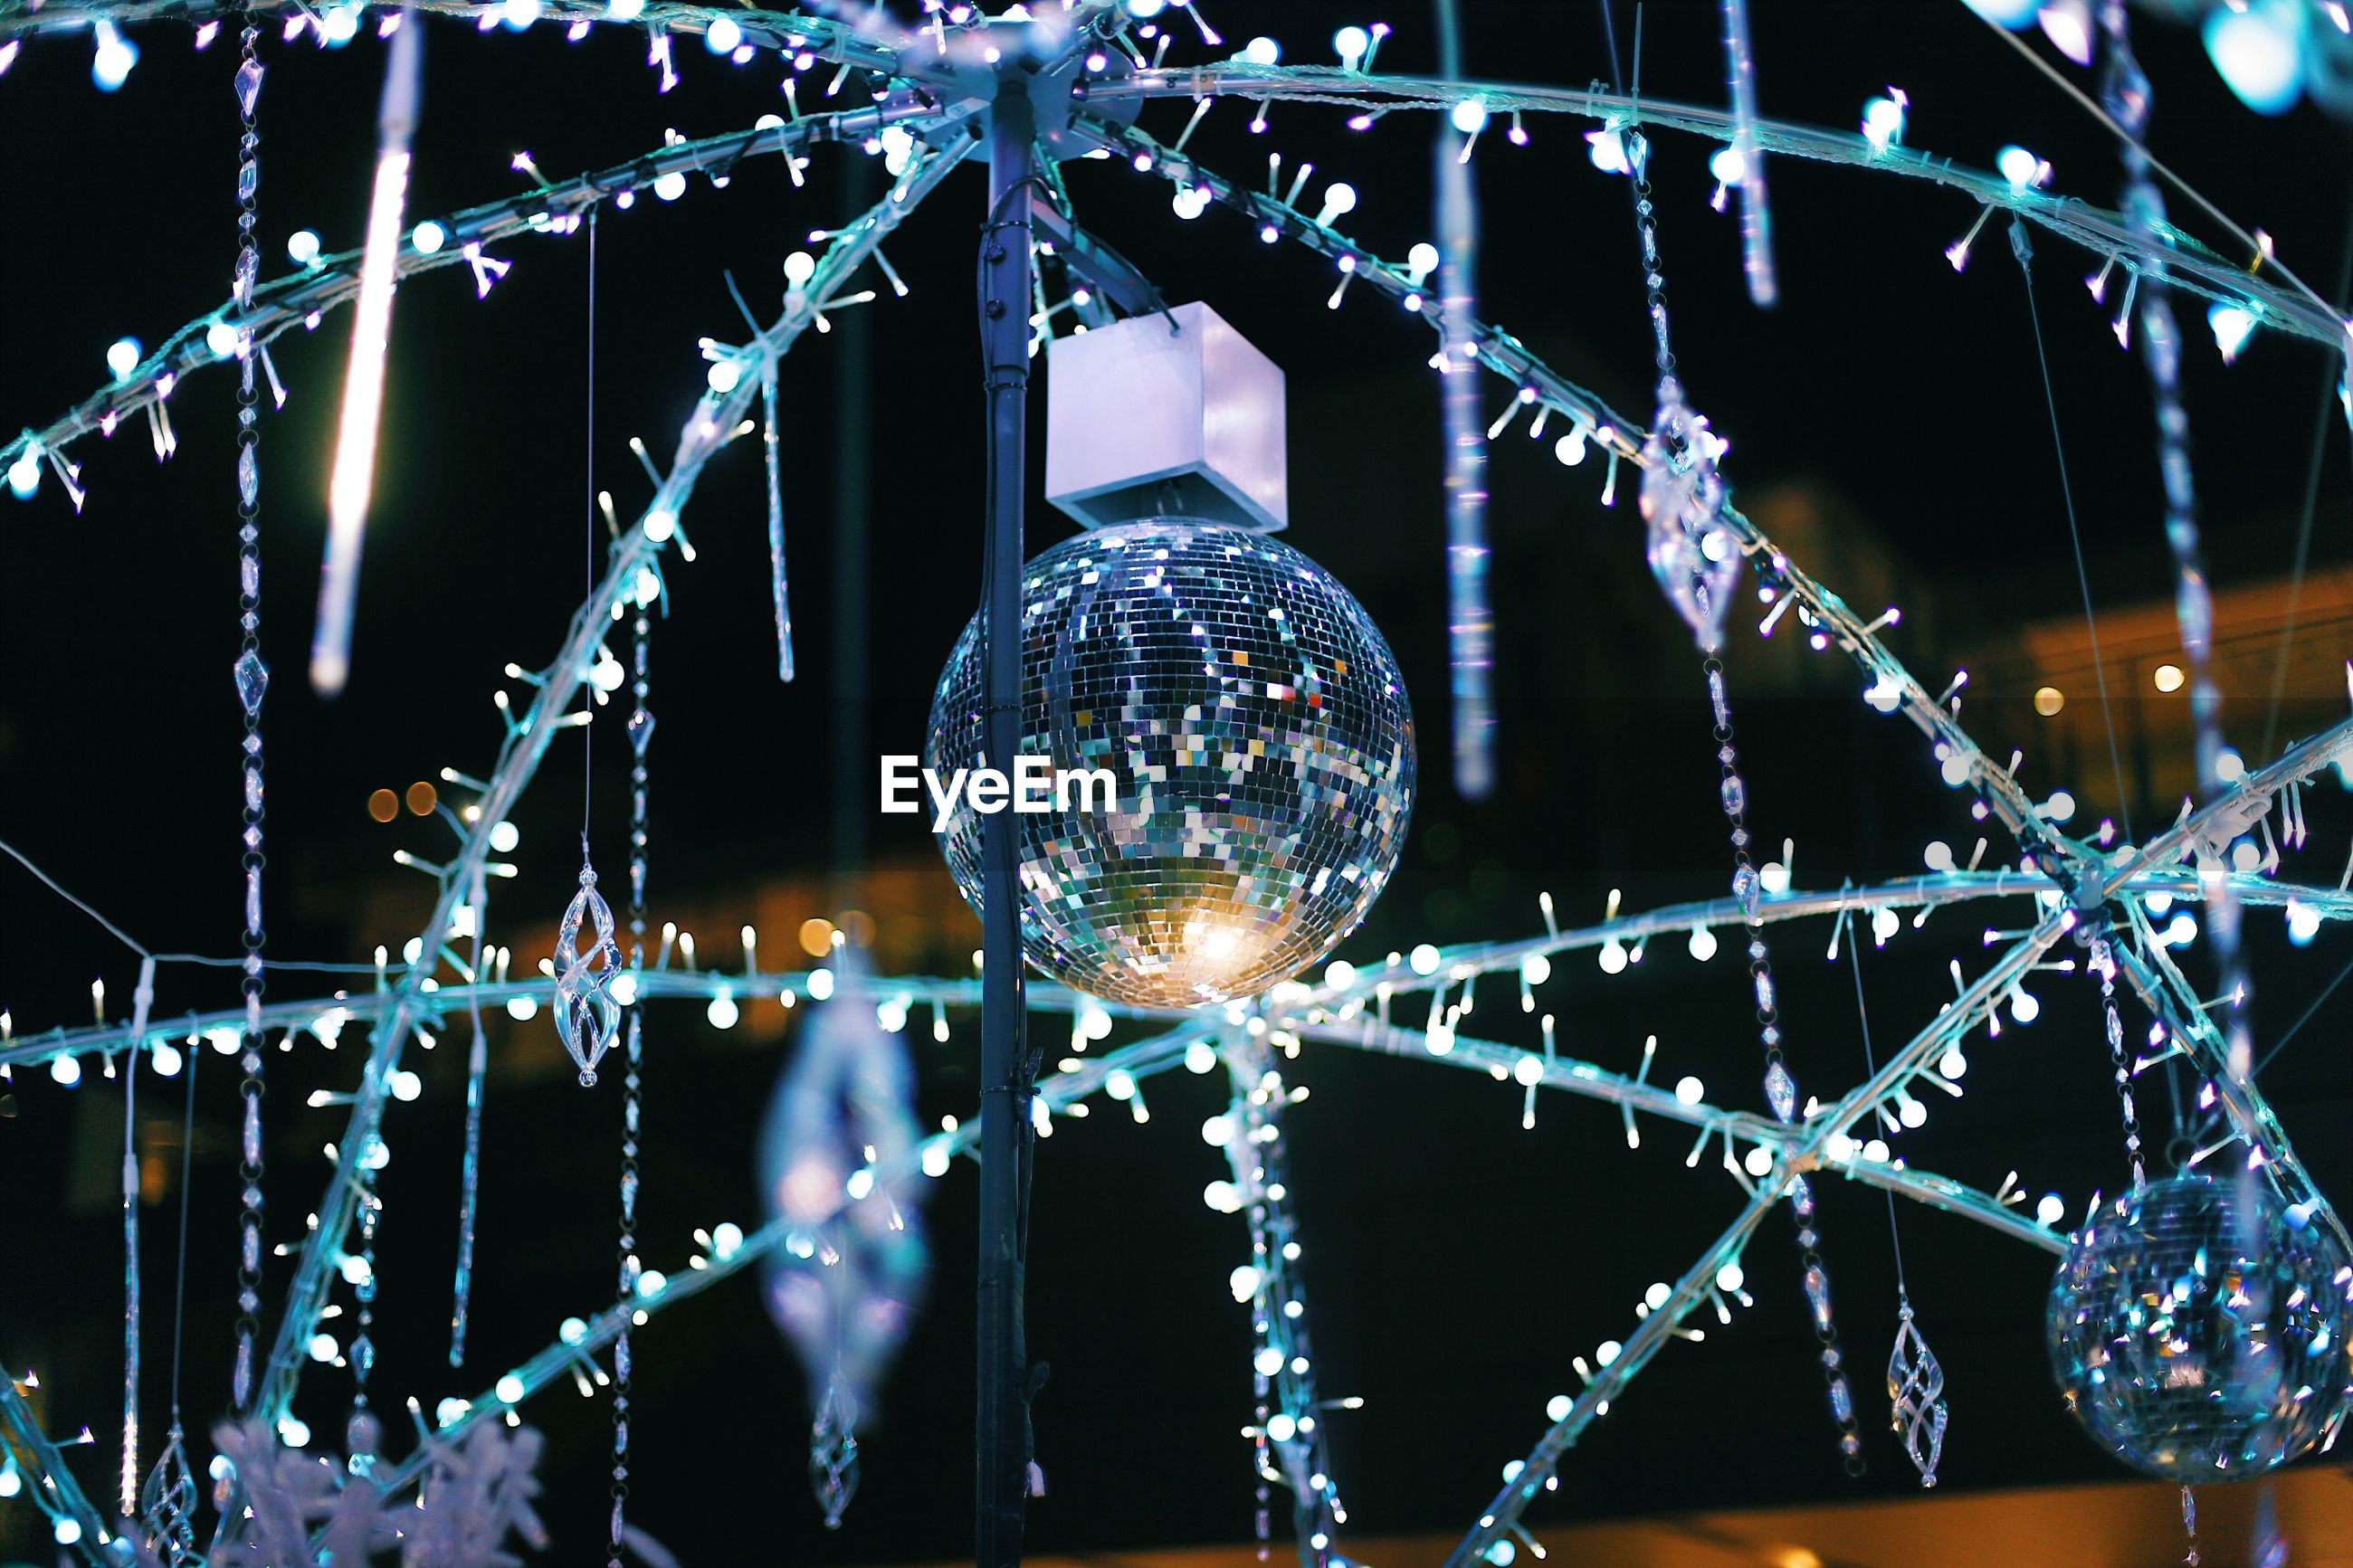 LOW ANGLE VIEW OF ILLUMINATED LANTERNS HANGING ON GLASS